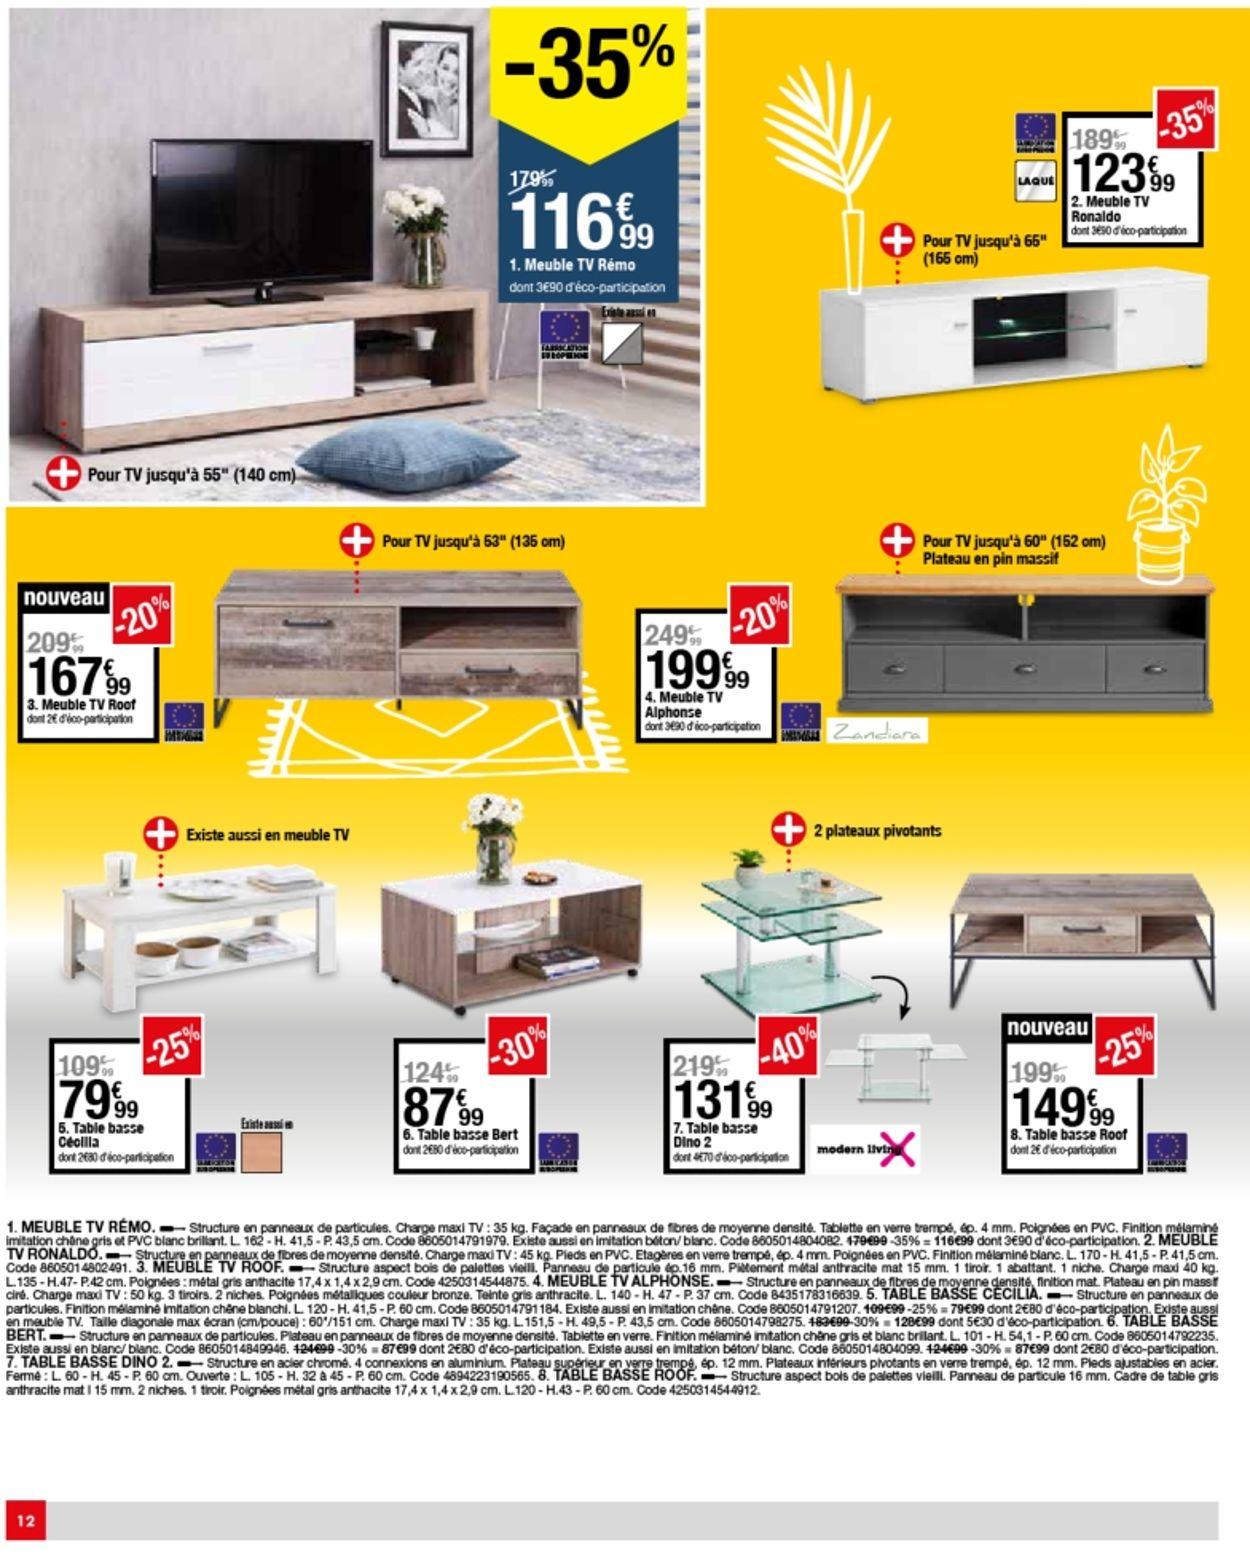 But Catalogue Actuel 12.05 - 06.07.2020 [12] - Catalogue-24 concernant Meuble Tv Alphonse But